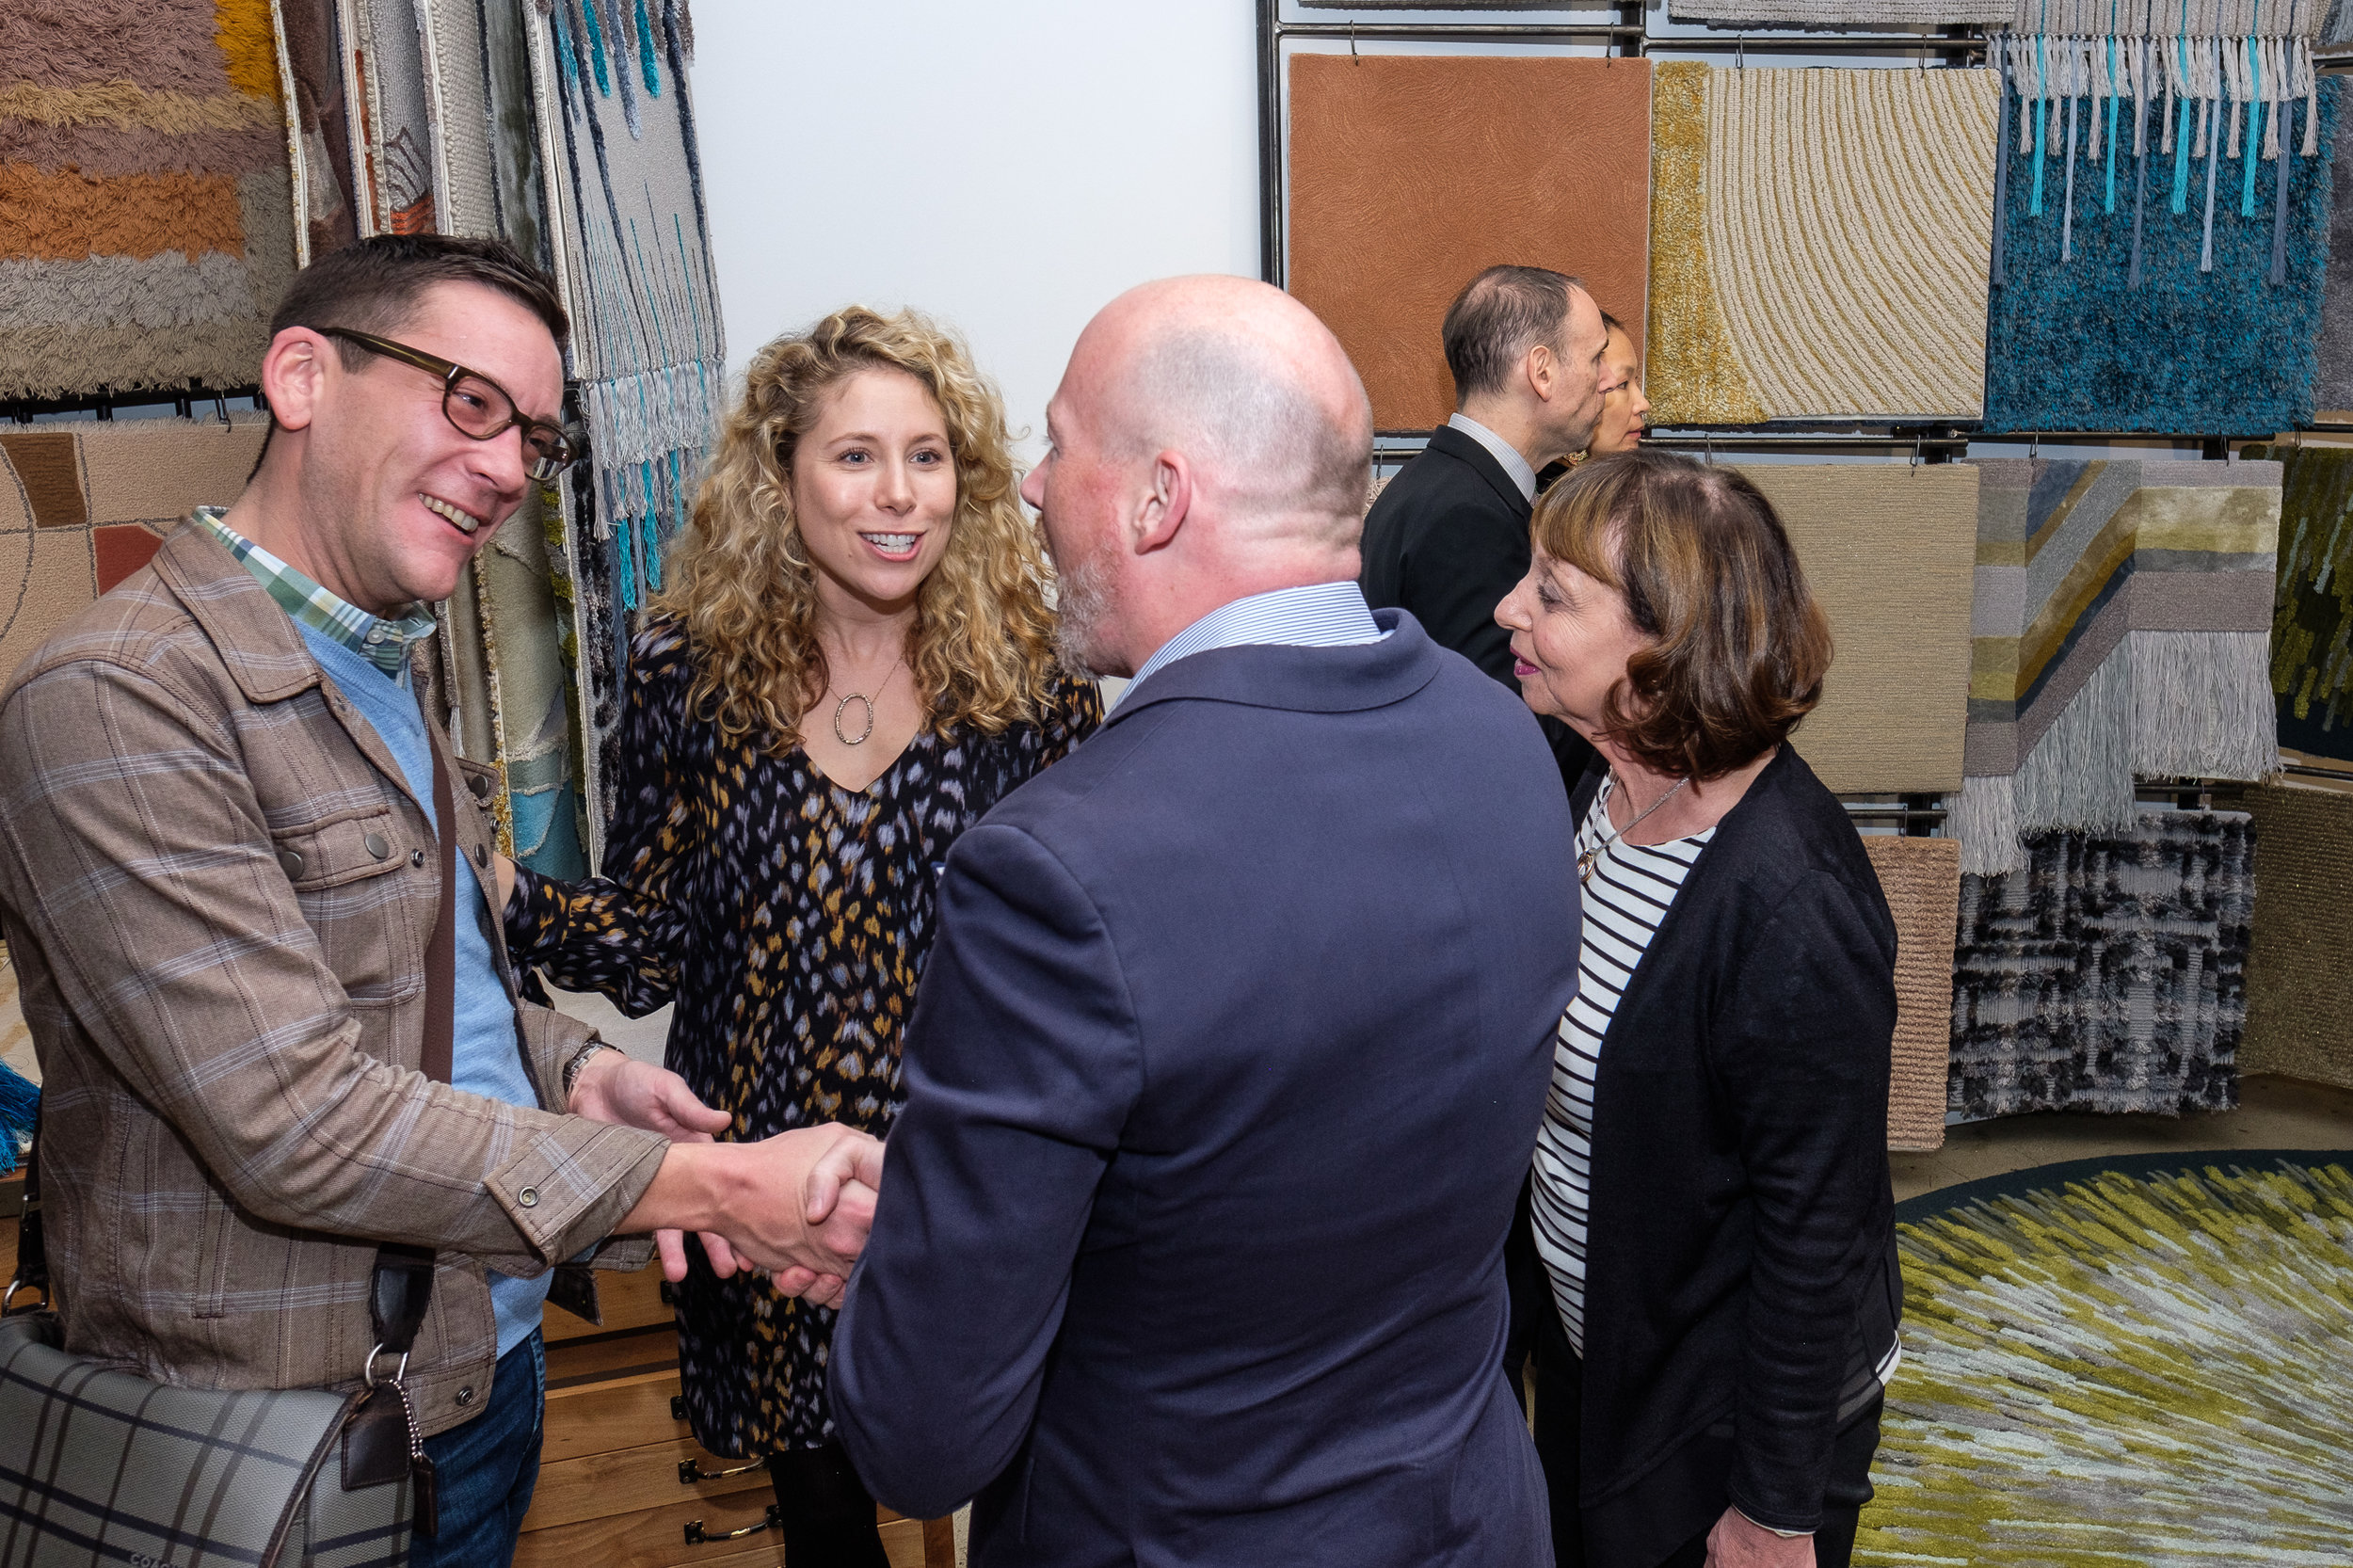 Bryan Jamison (1st Dibs), Laine Alexandra Blumenkopf (1st Dibs), Jonathan Arnold (Edward Fields), Liz Nightingale (D&D Building)